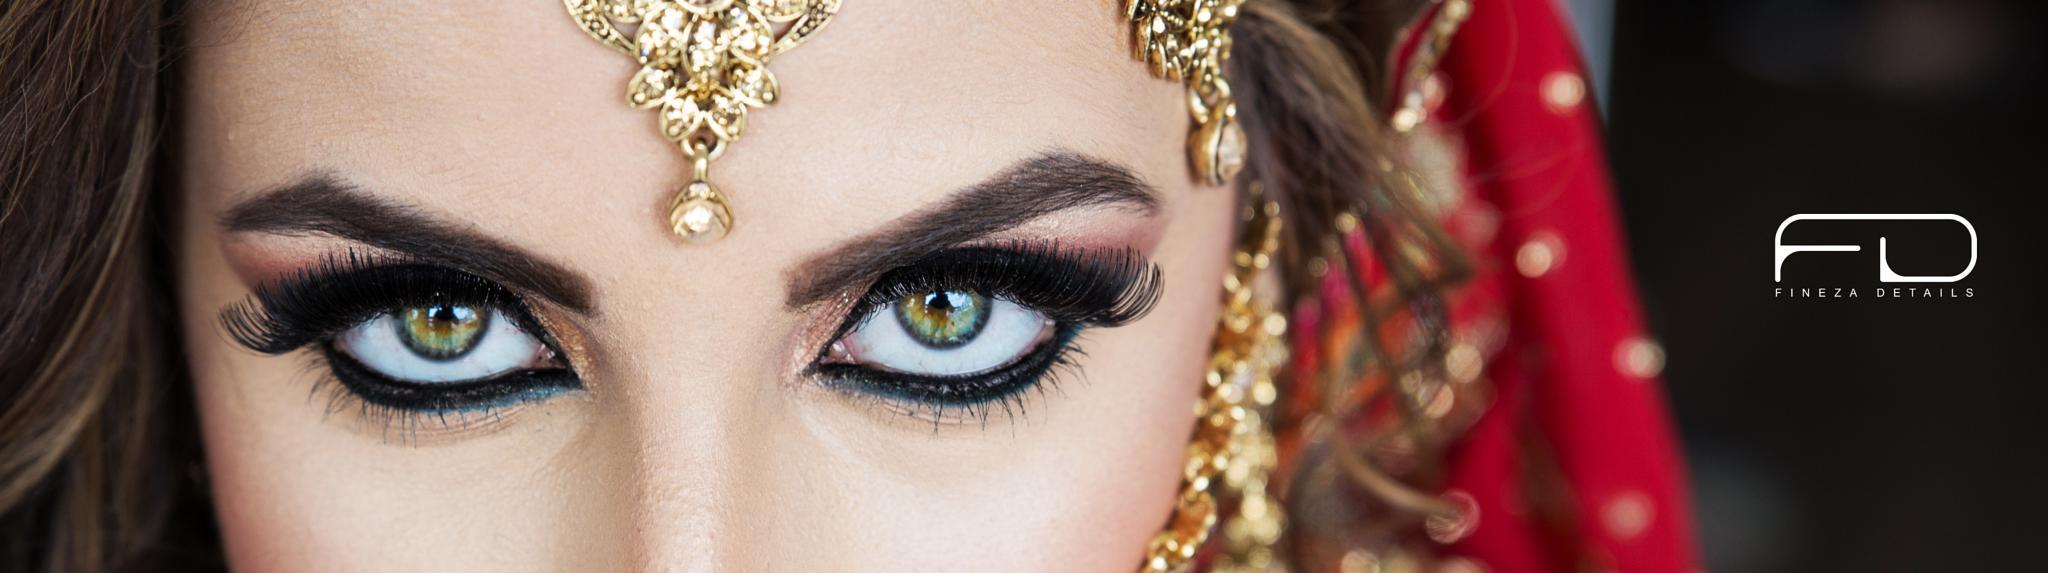 Bright Eyes by Khalid_Fineza  Details